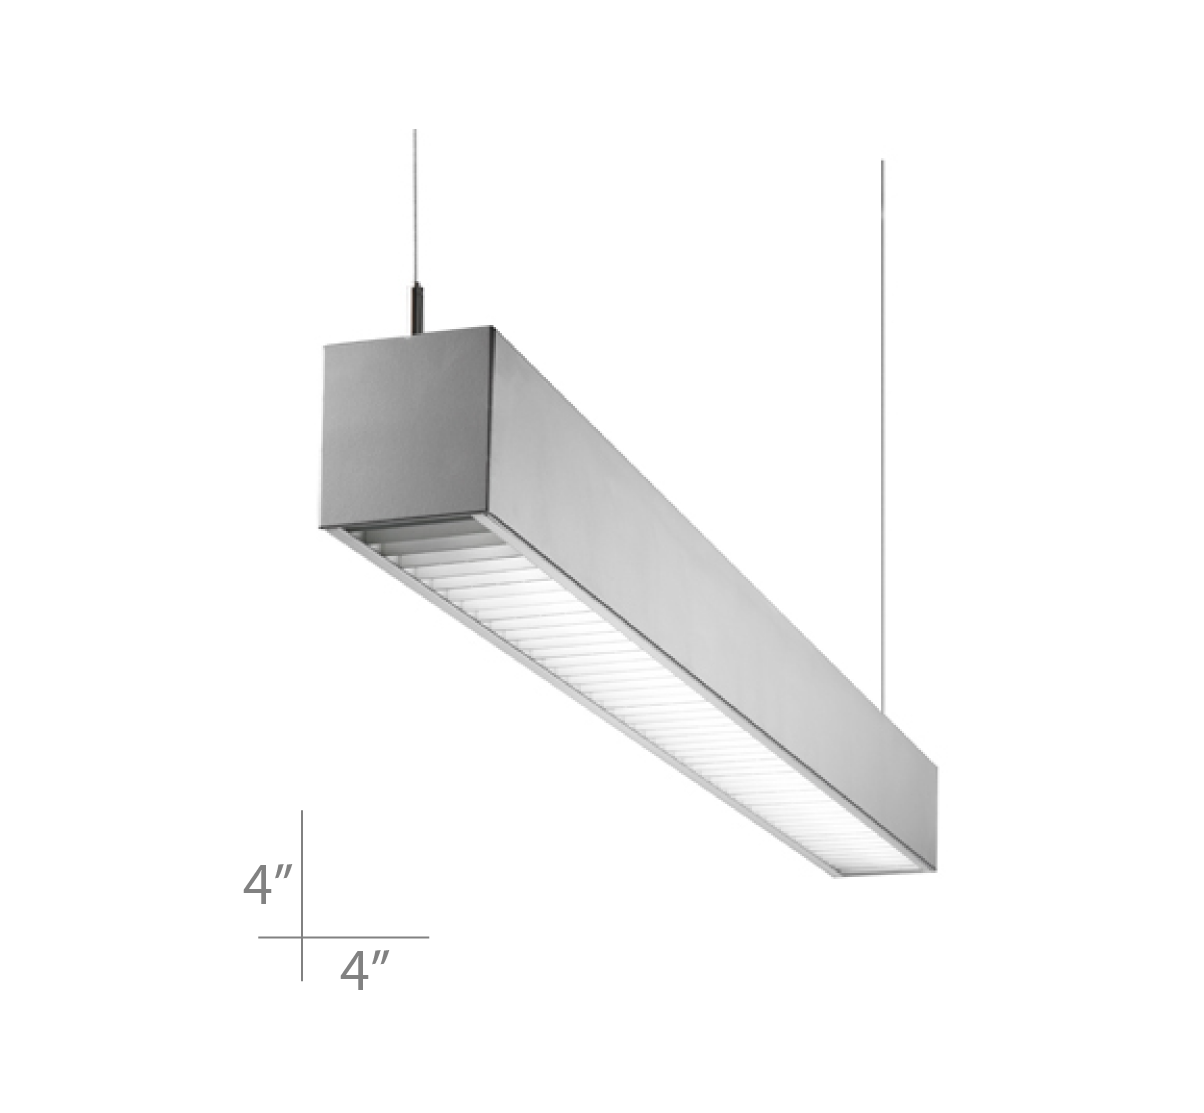 Alcon lighting colt 12220 linear led pendant light fixture with alcon lighting colt 12220 linear led pendant light fixture with parabolic louver direct alconlighting arubaitofo Gallery